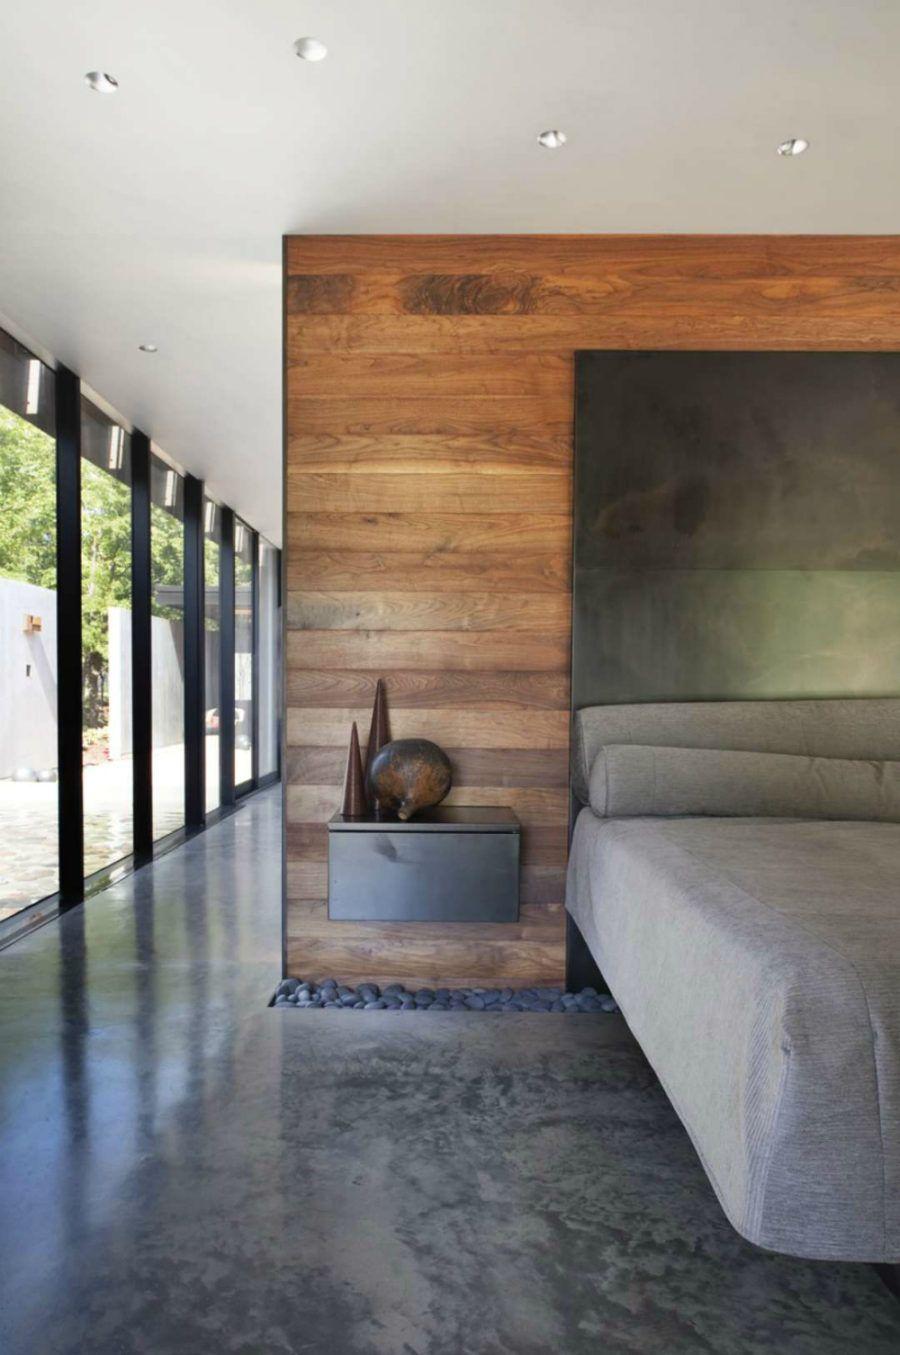 Stylish Concrete Interiors For Contemporary Homes Bedroom Design House Design Interior Design